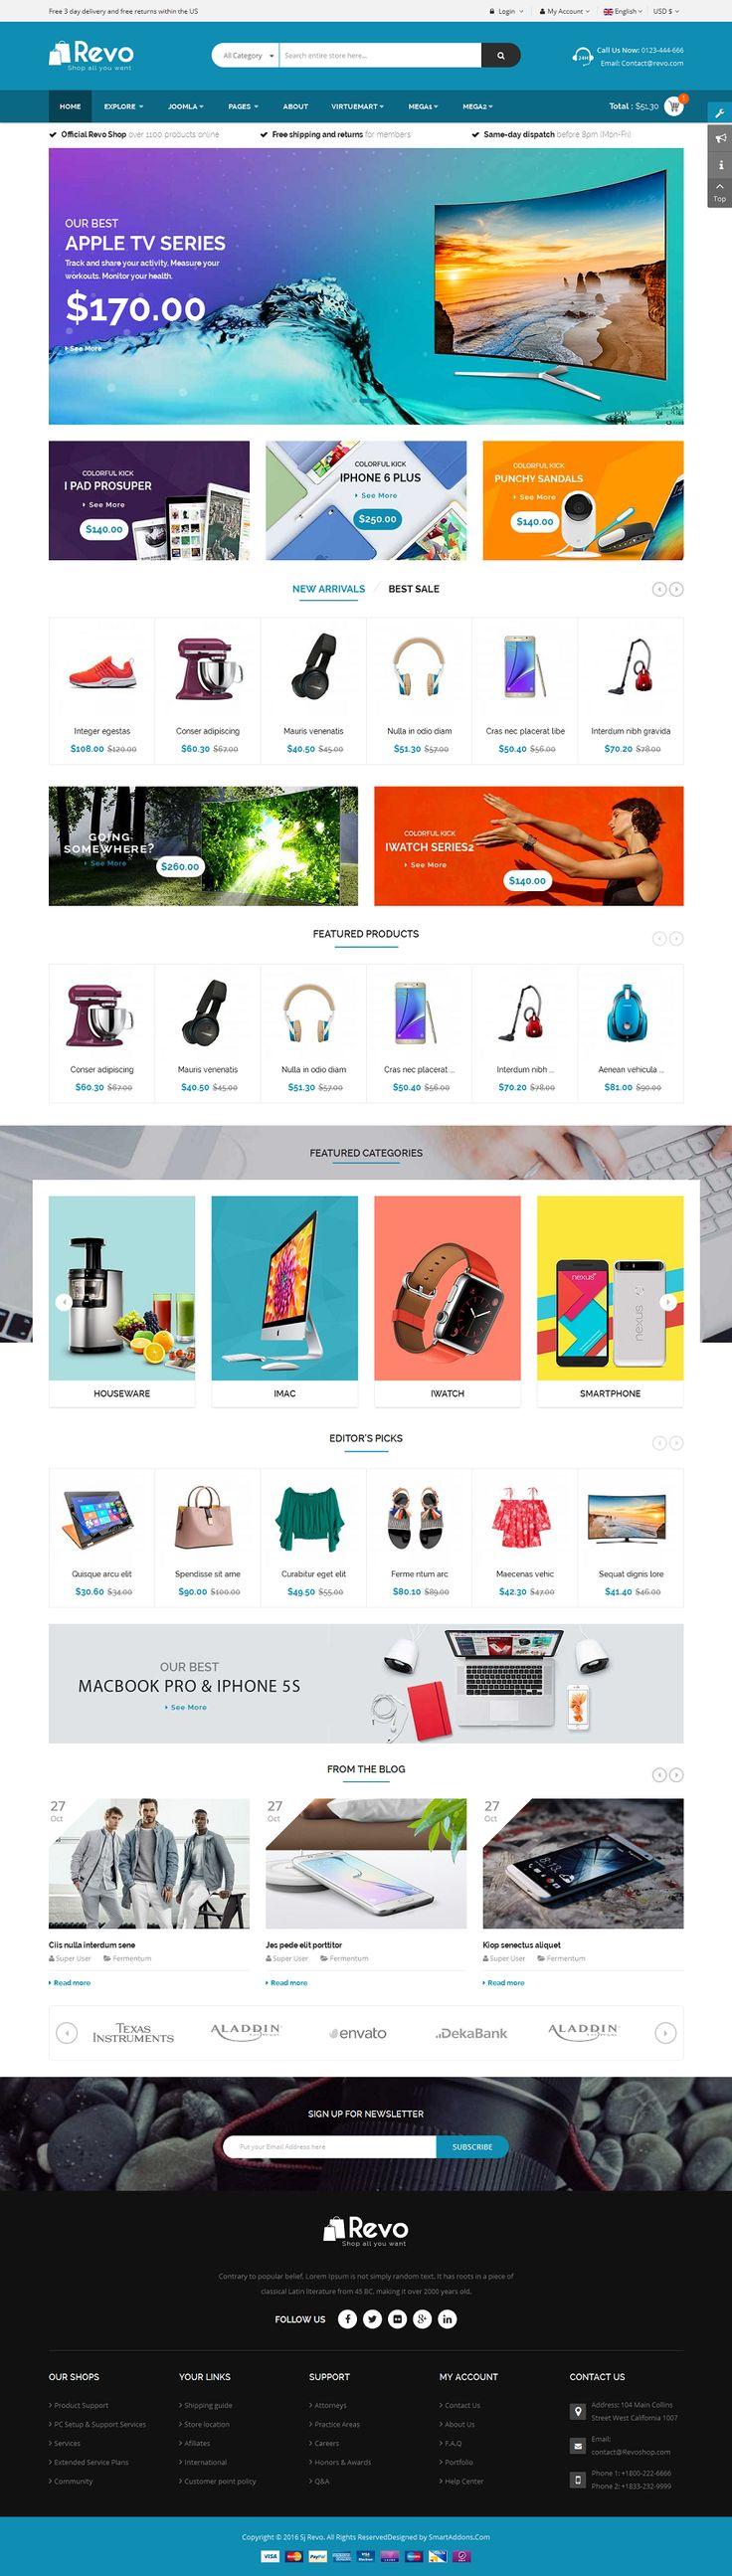 165 best Joomla Templates (PRO!) images on Pinterest